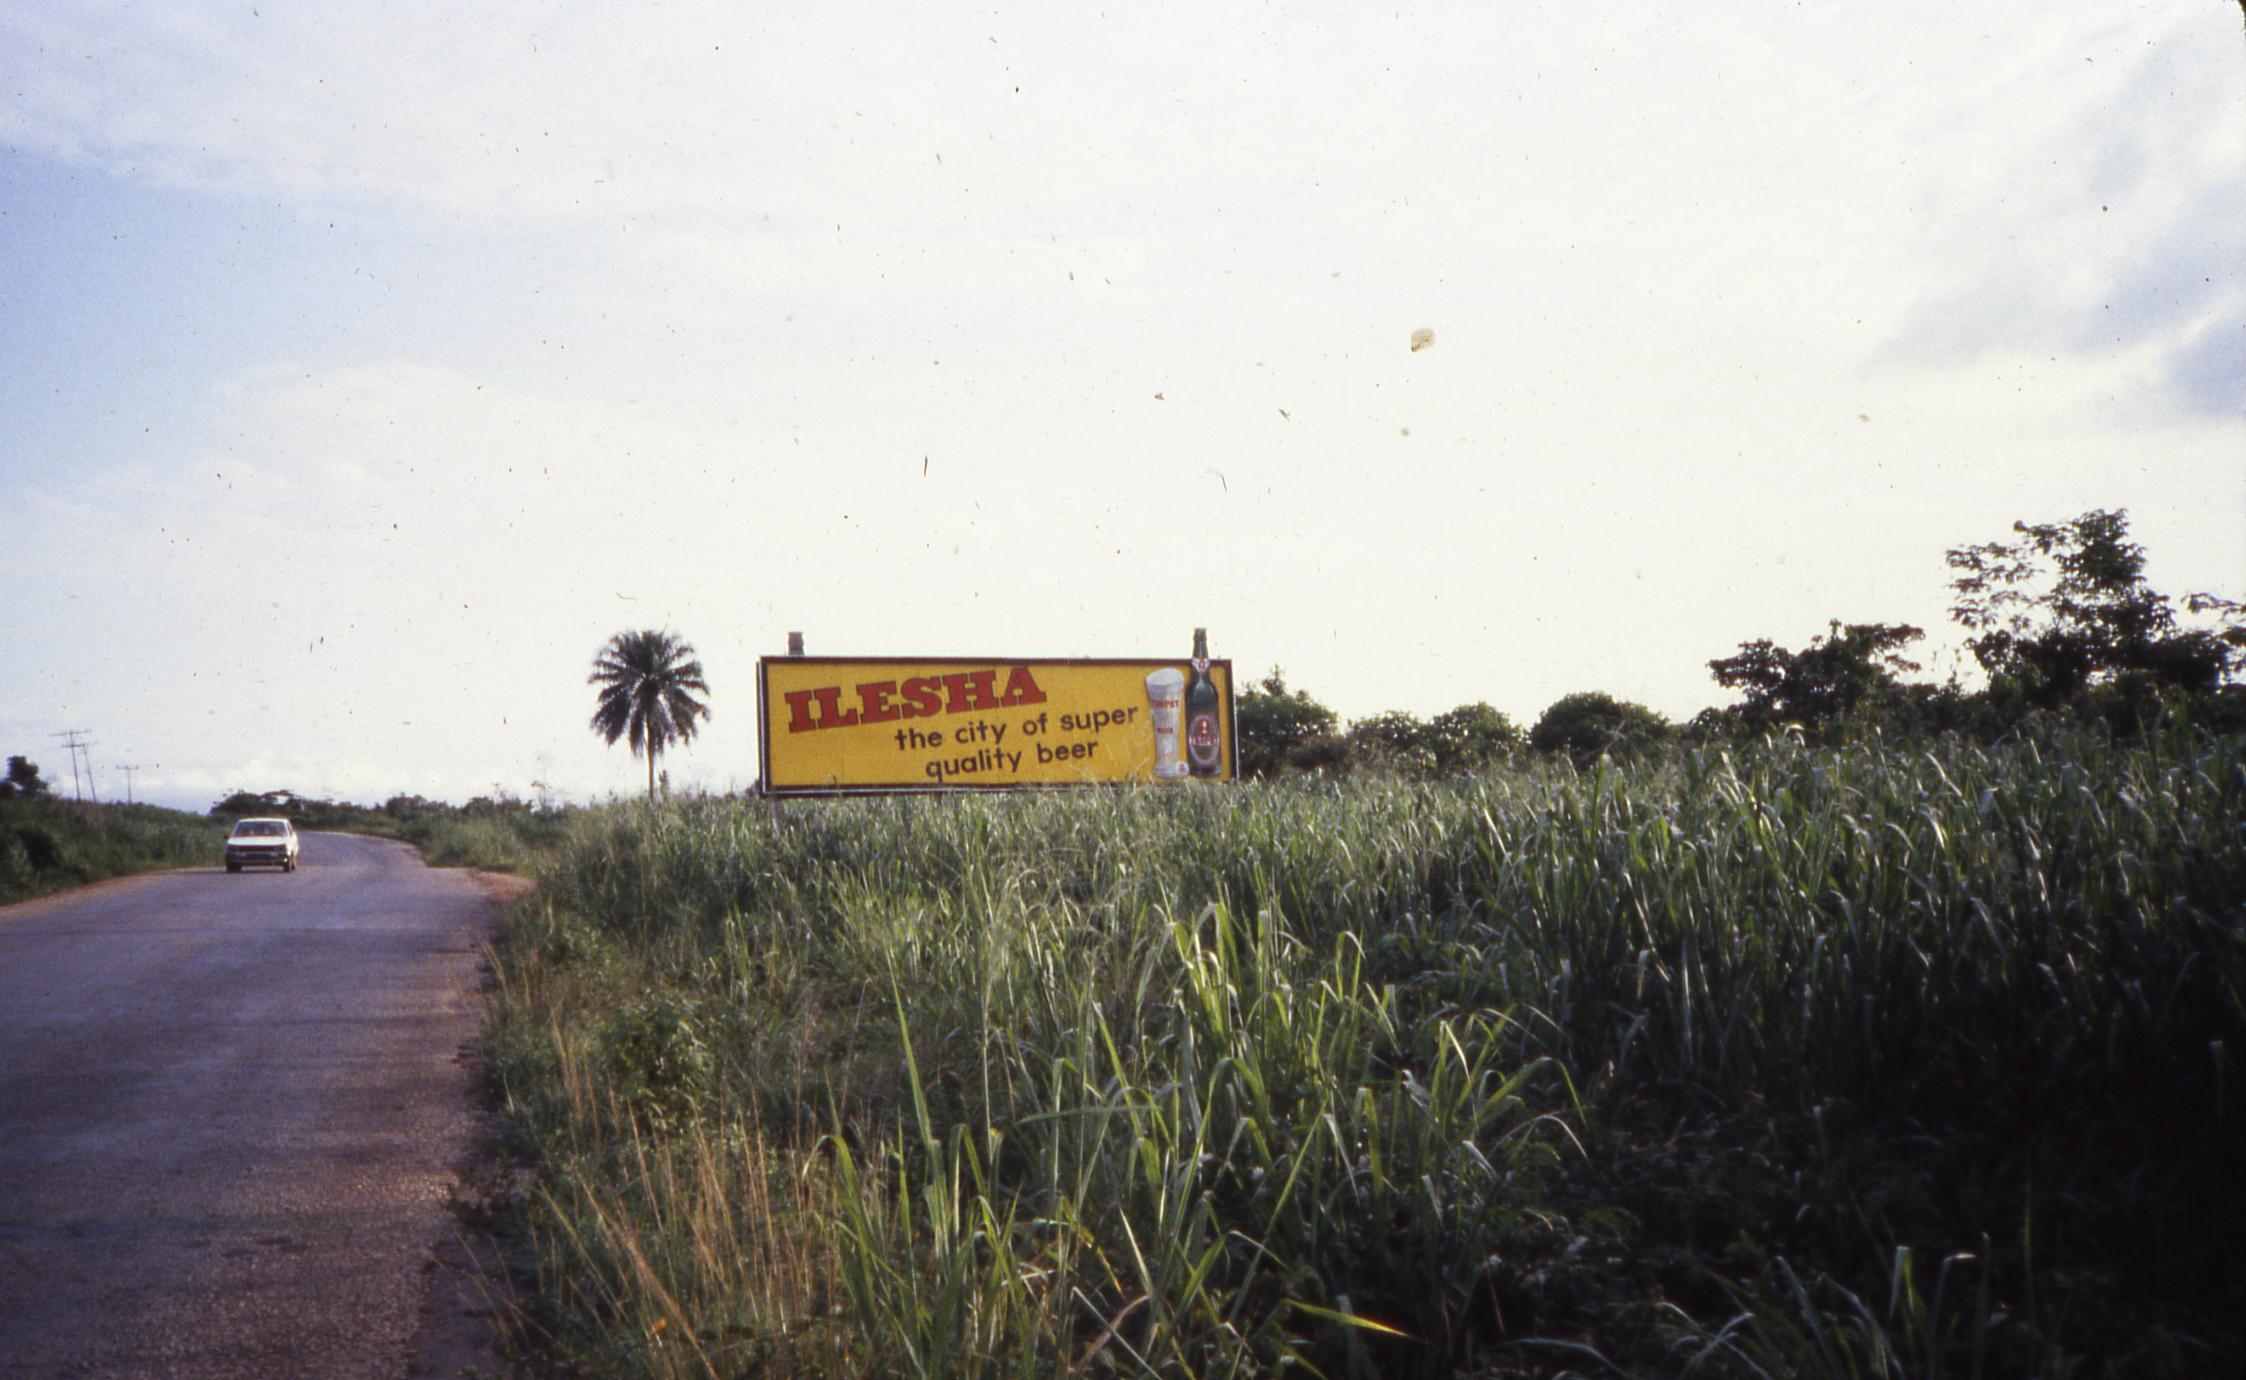 Billboard for Ilesa in outskirts of Ilesa